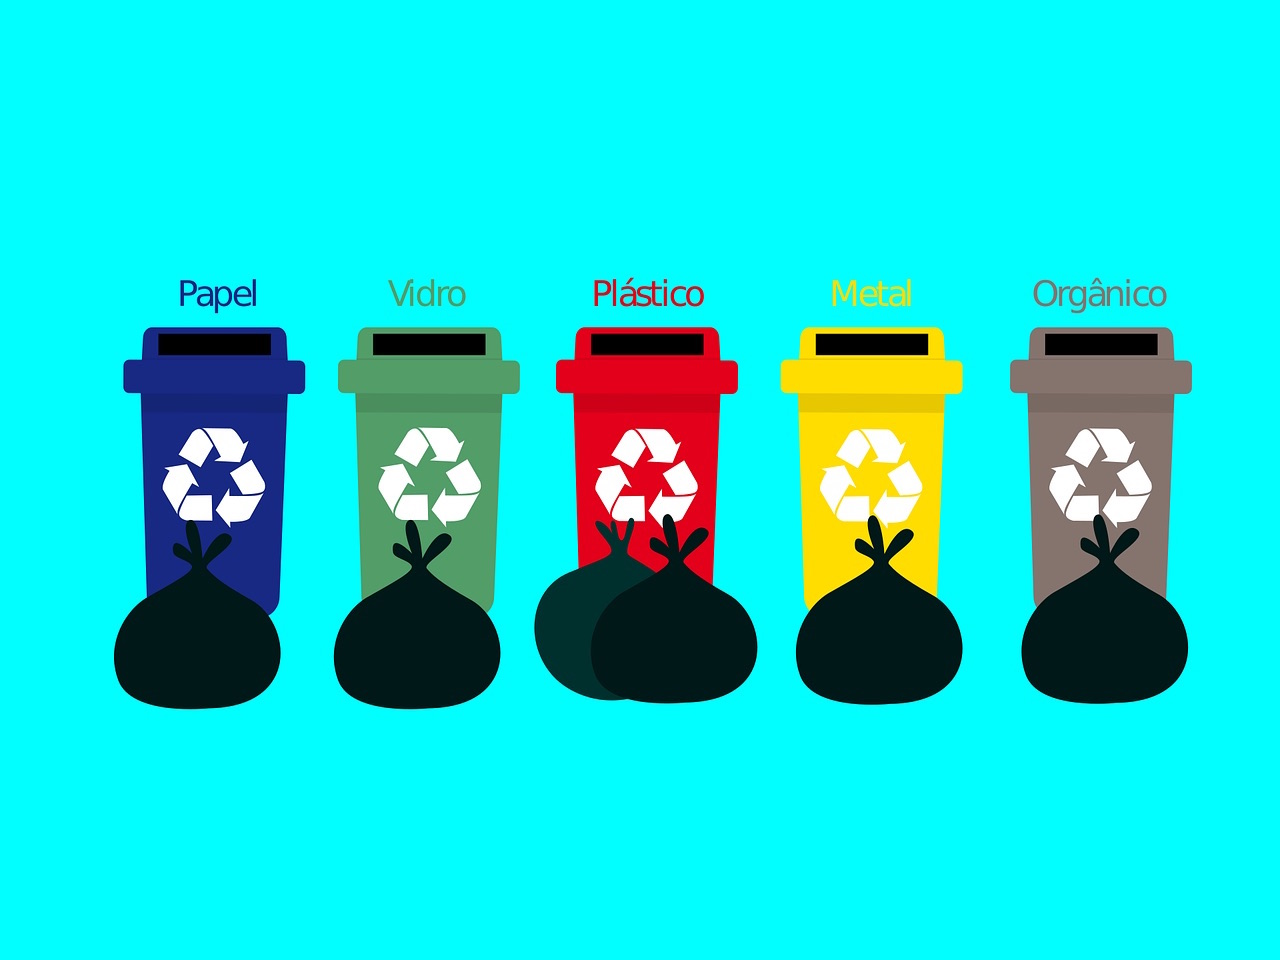 【Windows10】ゴミ箱の場所と表示・非表示を切り替える方法